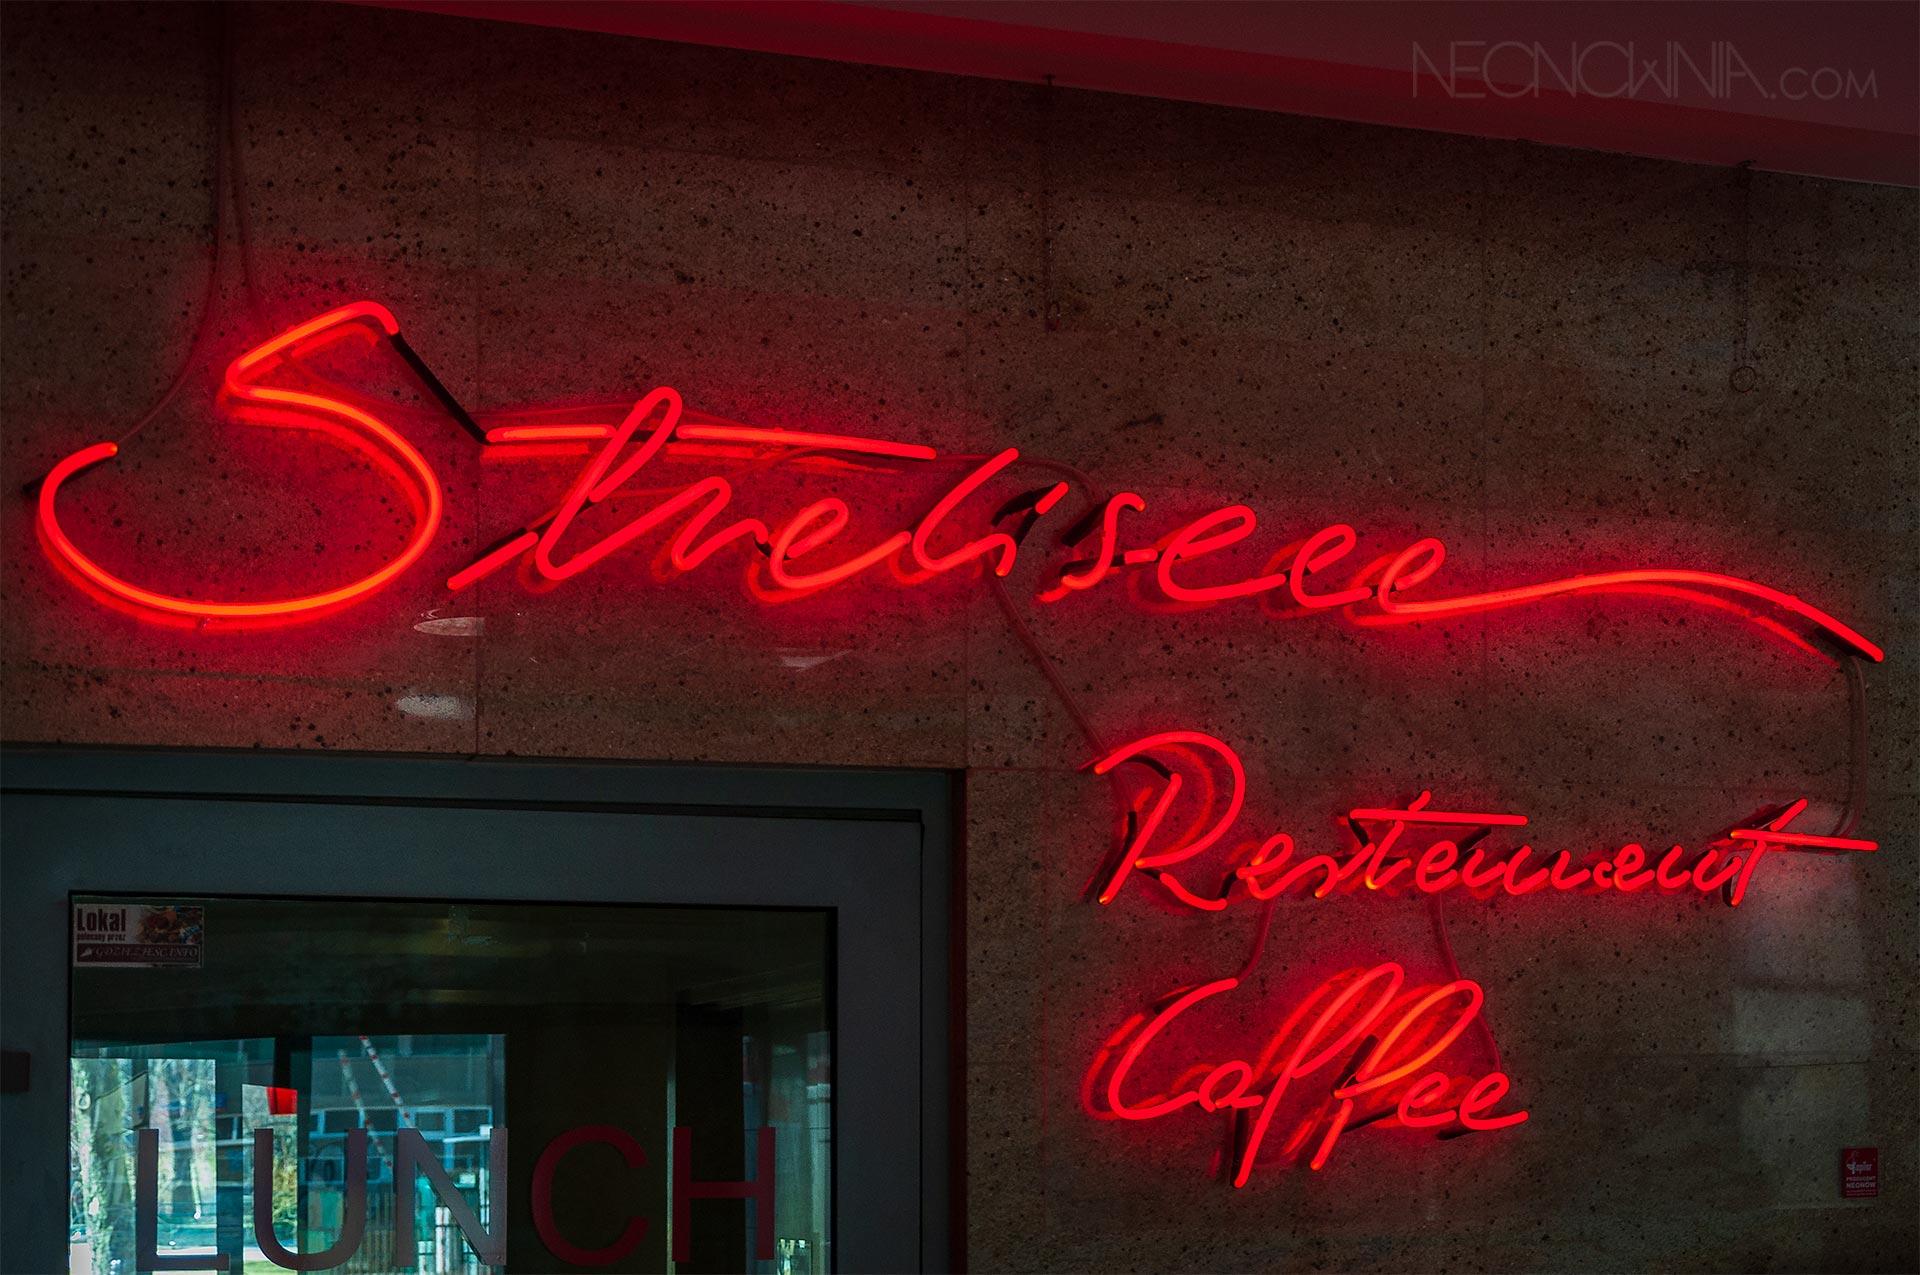 STRELISEEE RESTAURANT CAFFEE